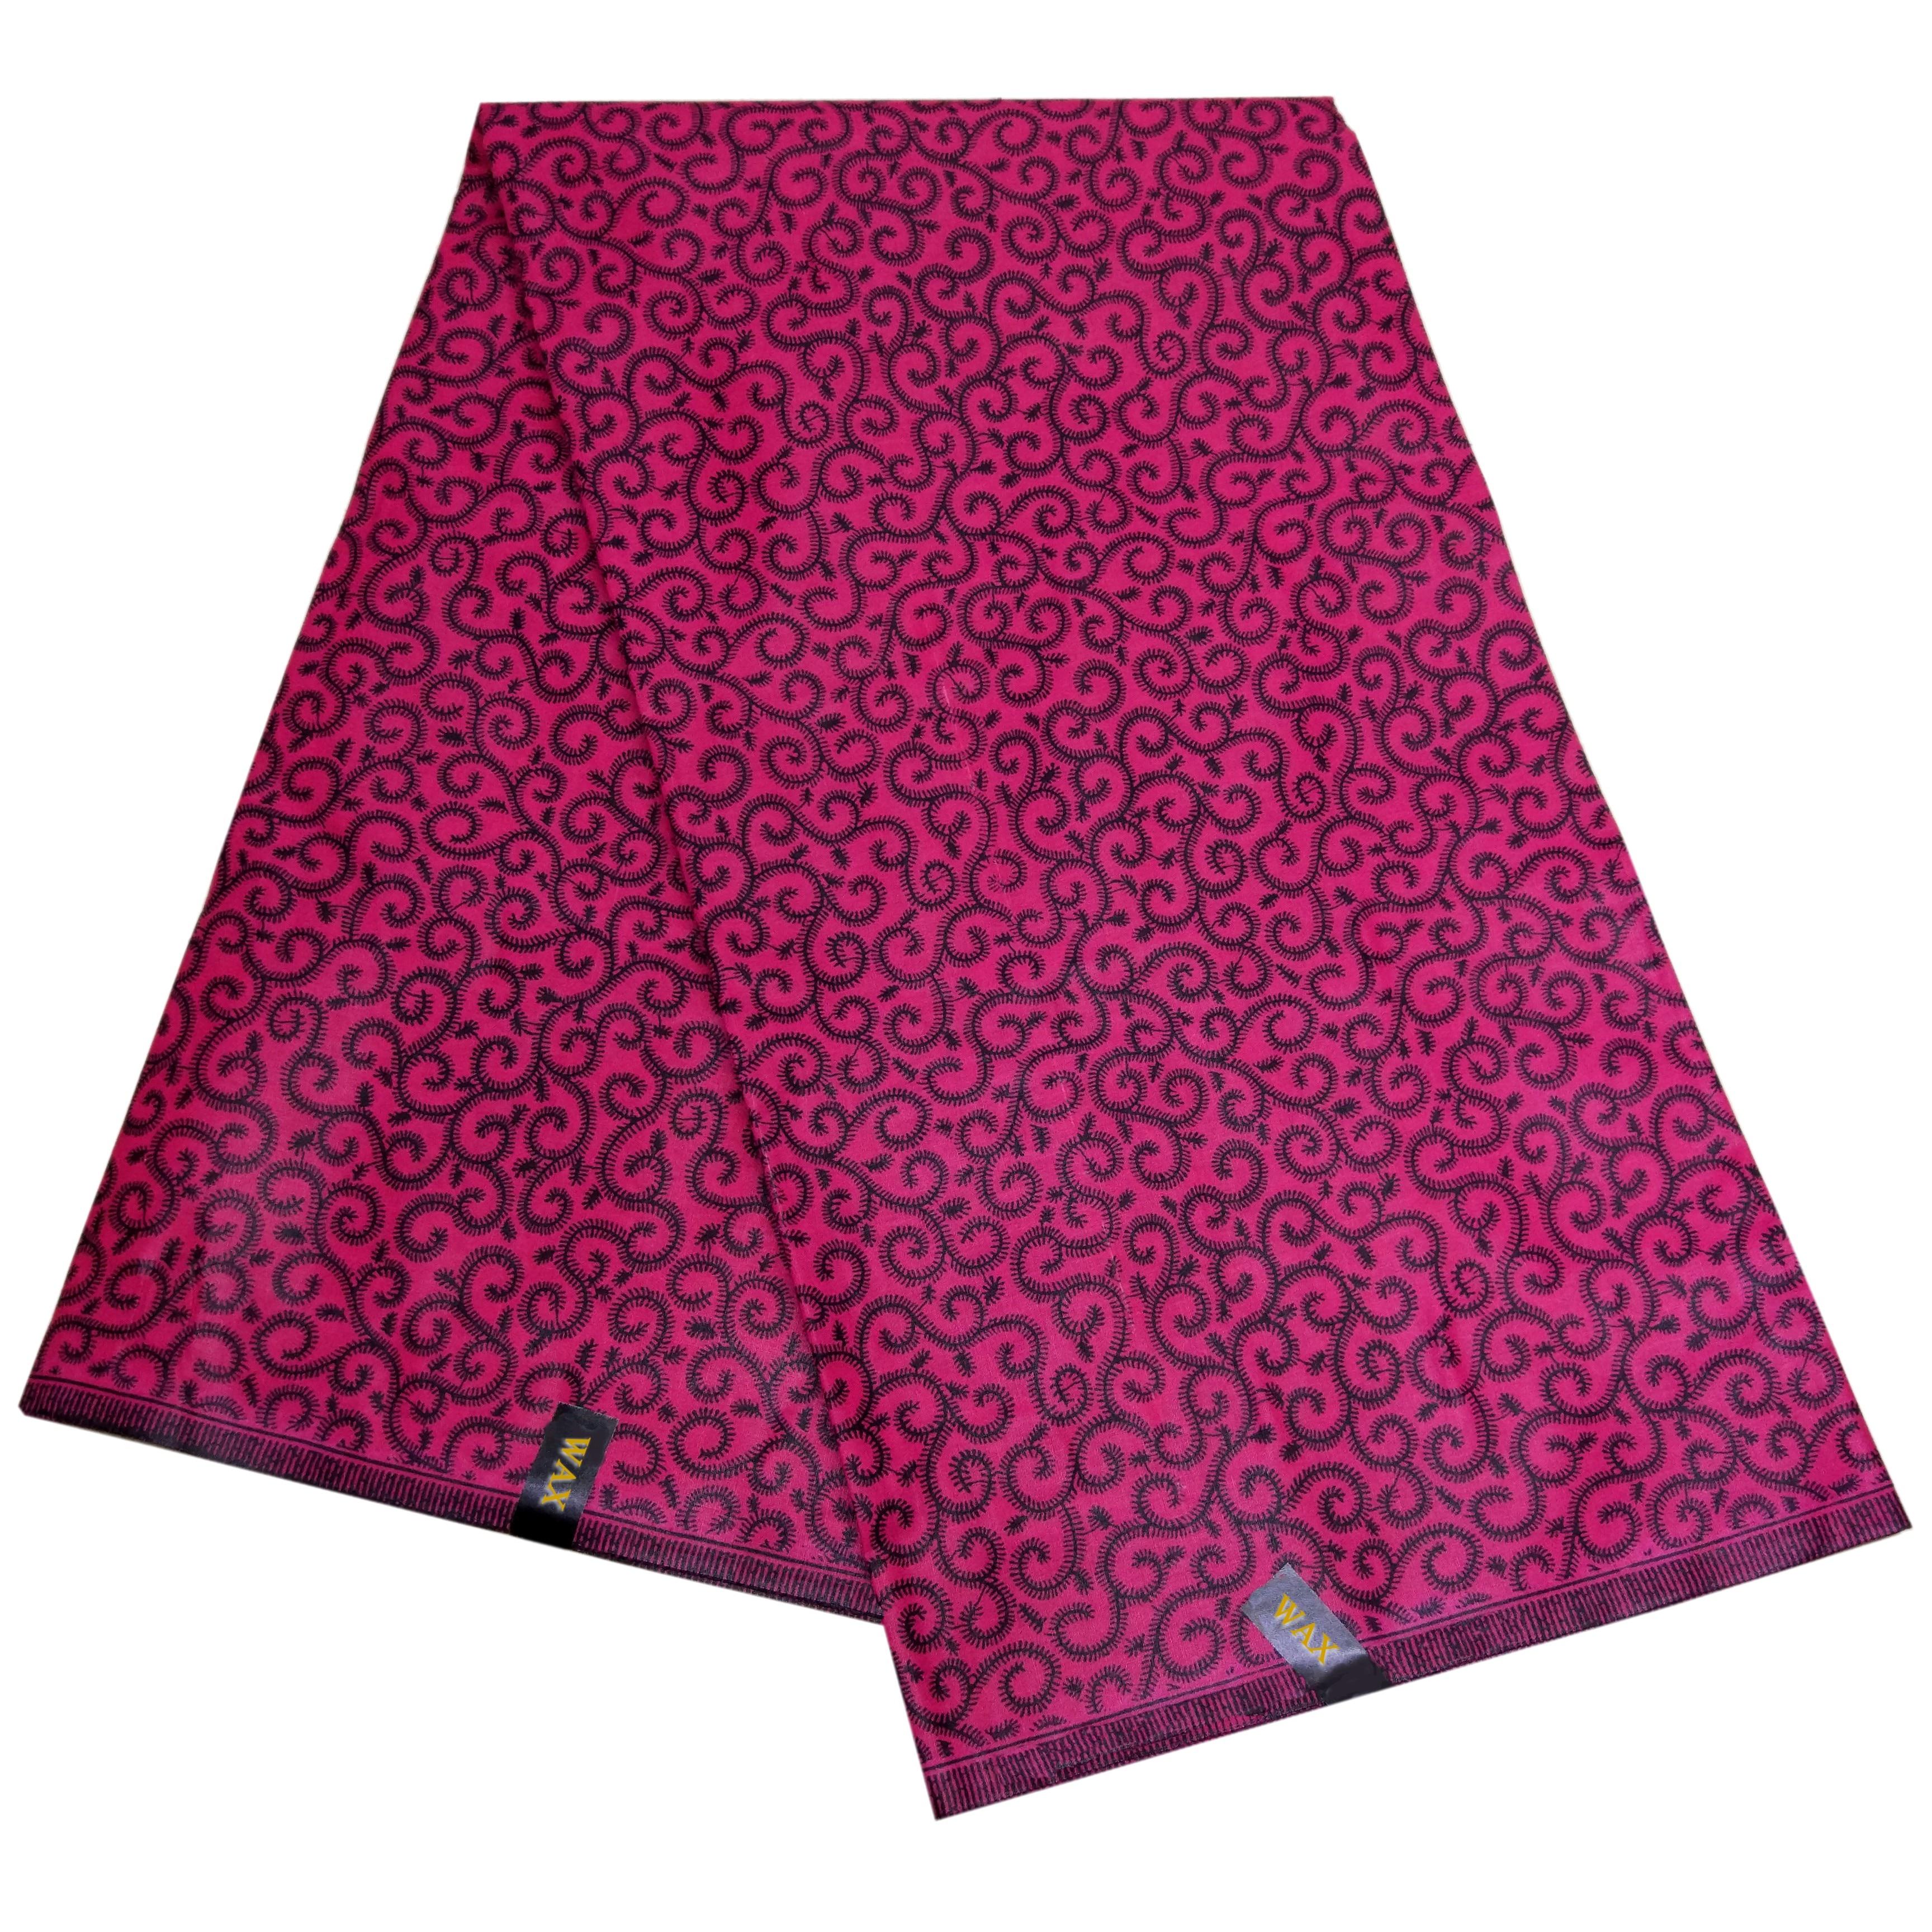 African Dashiki Dutch Wax Fabric Floral Print Fuchsia Wax Fabric